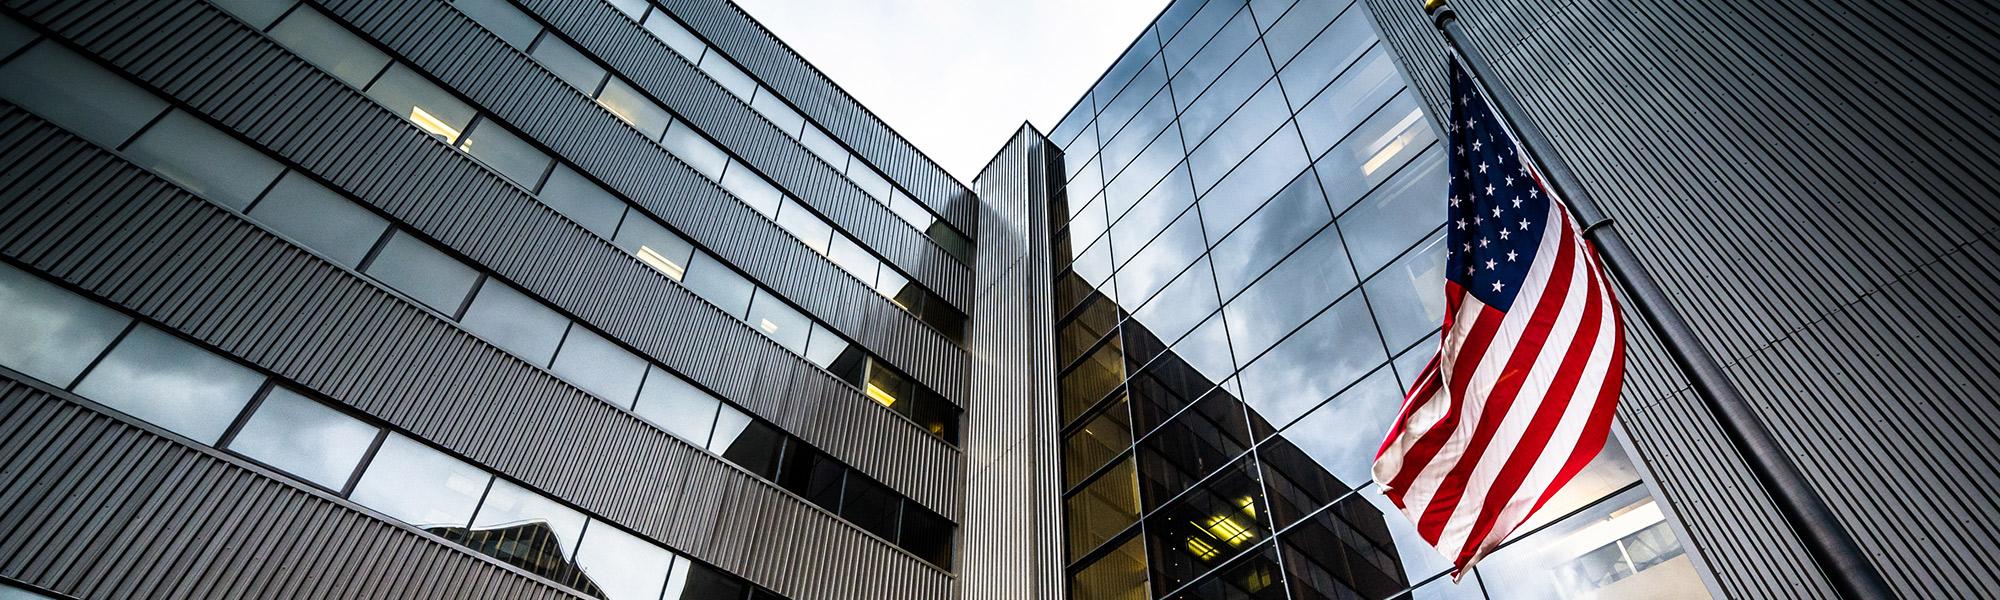 Pennsylvania window tinting company